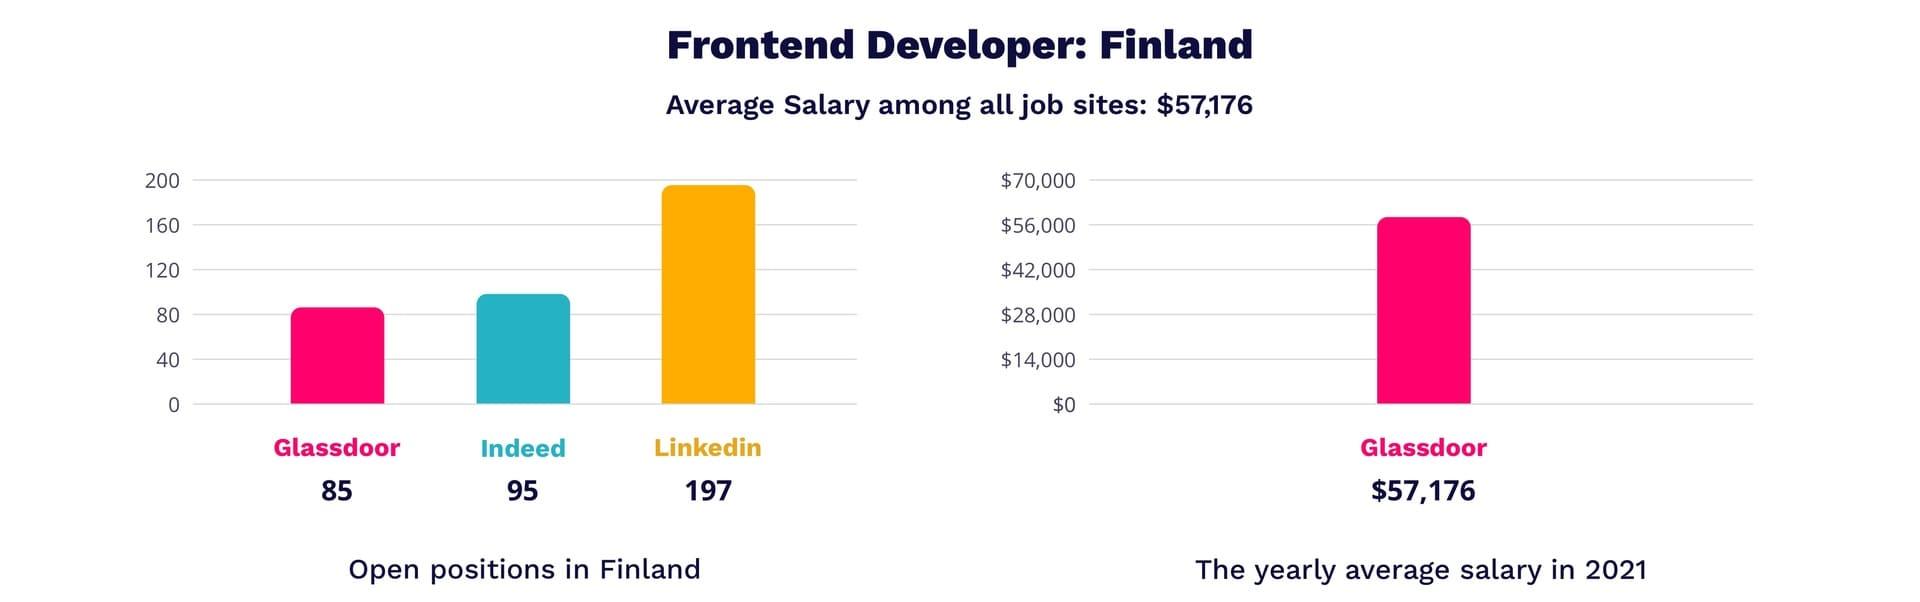 Frontend developer salary in Finland